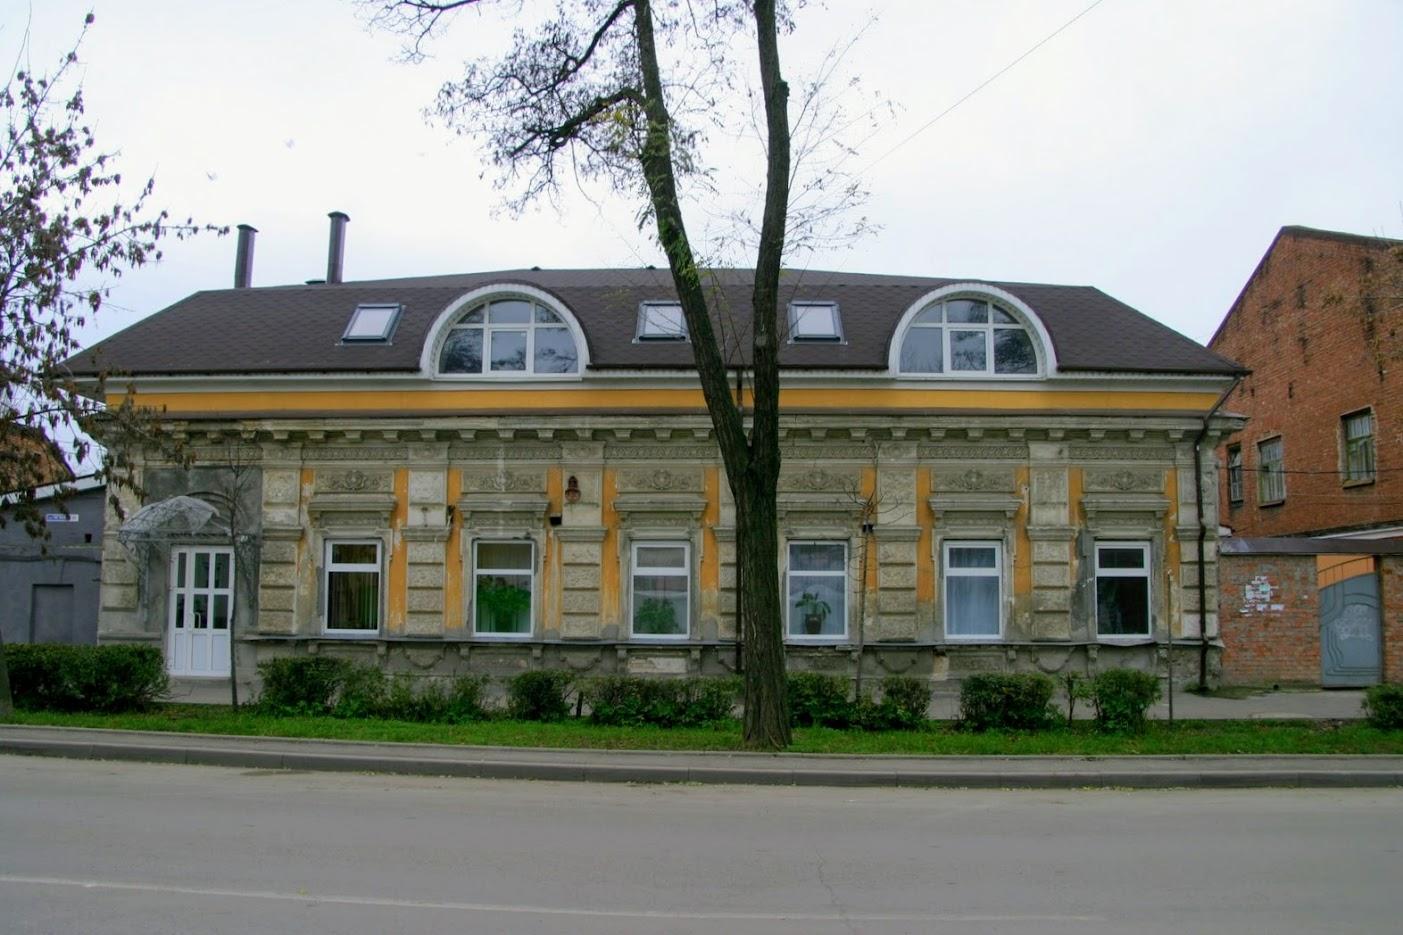 https://sites.google.com/site/istoriceskijtaganrog/cehova-ulica/dom-101